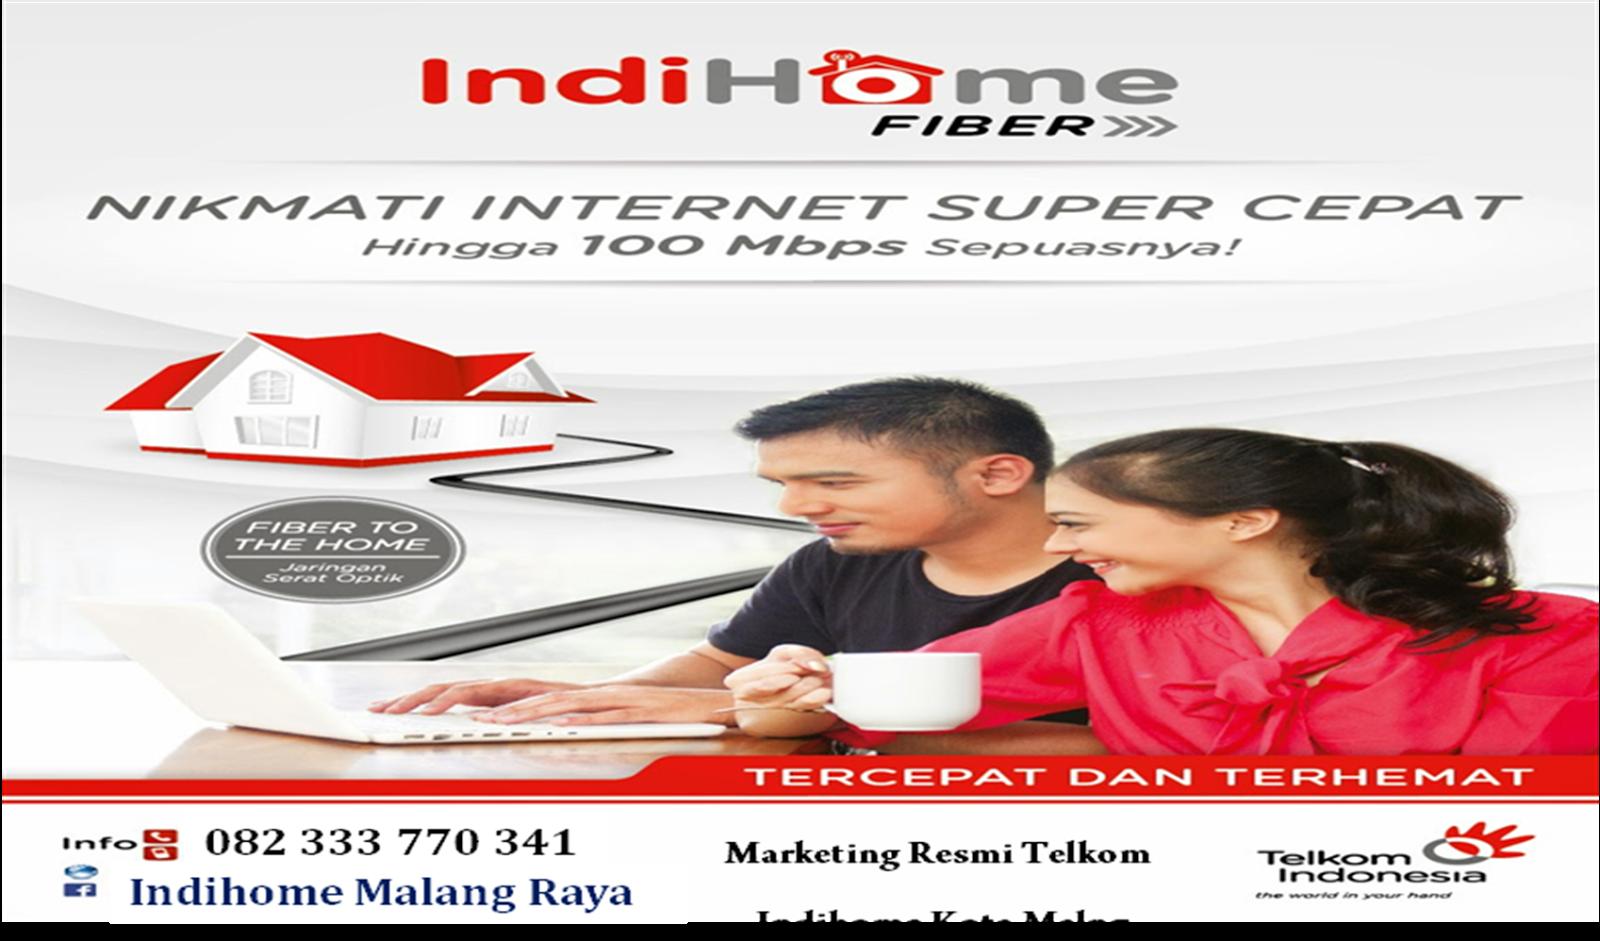 third image of Indihome Kota Malang Promo Indihome 2015 Malang with PROMO PAKET INDIHOME KOTA MALANG: PROMO INDIHOME KOTA ...